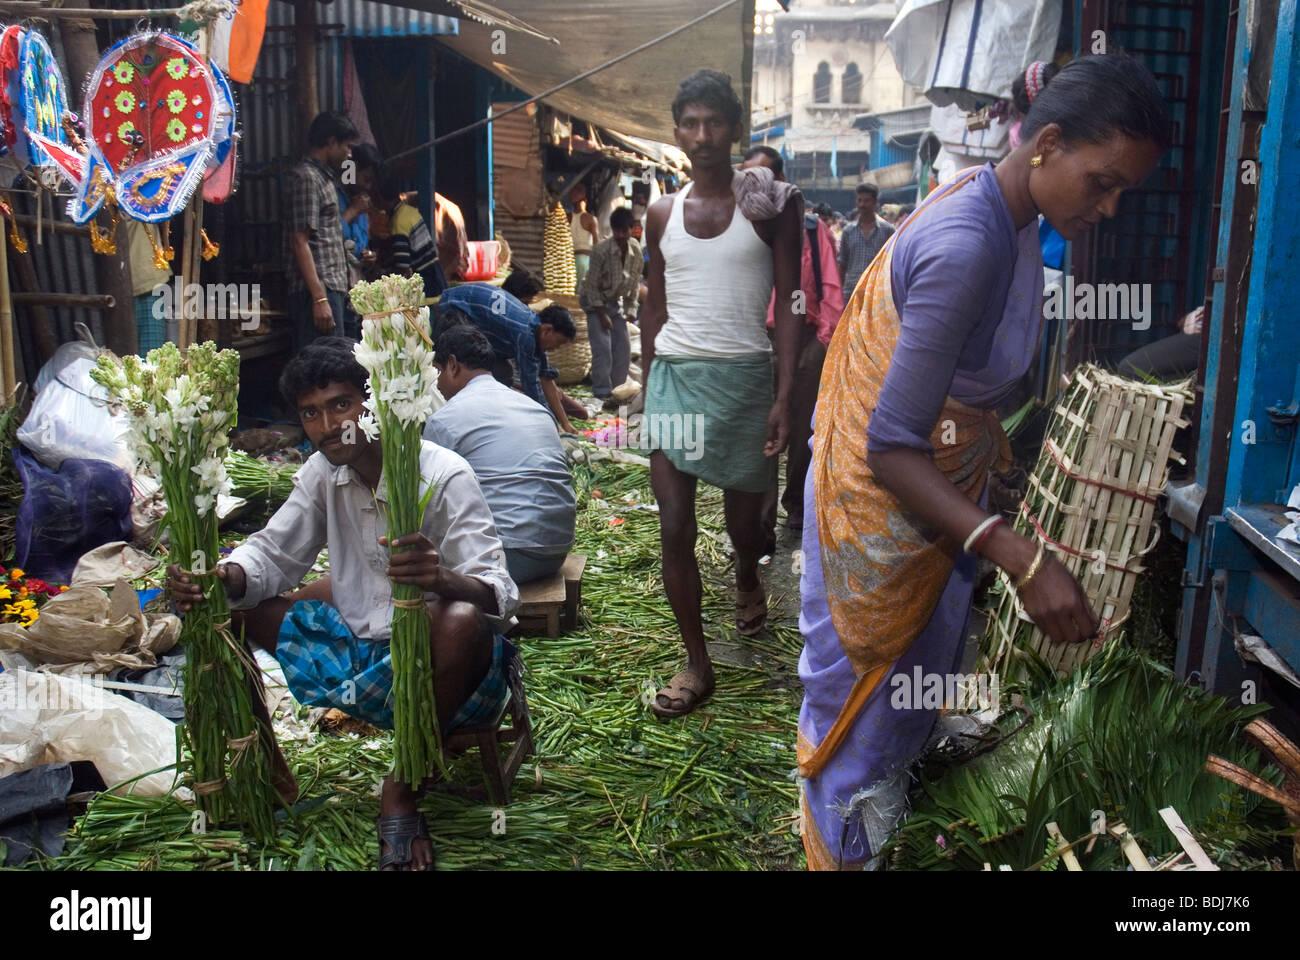 Flower Market at Mullick Ghaat, Kolkata, West Bengala, India. - Stock Image